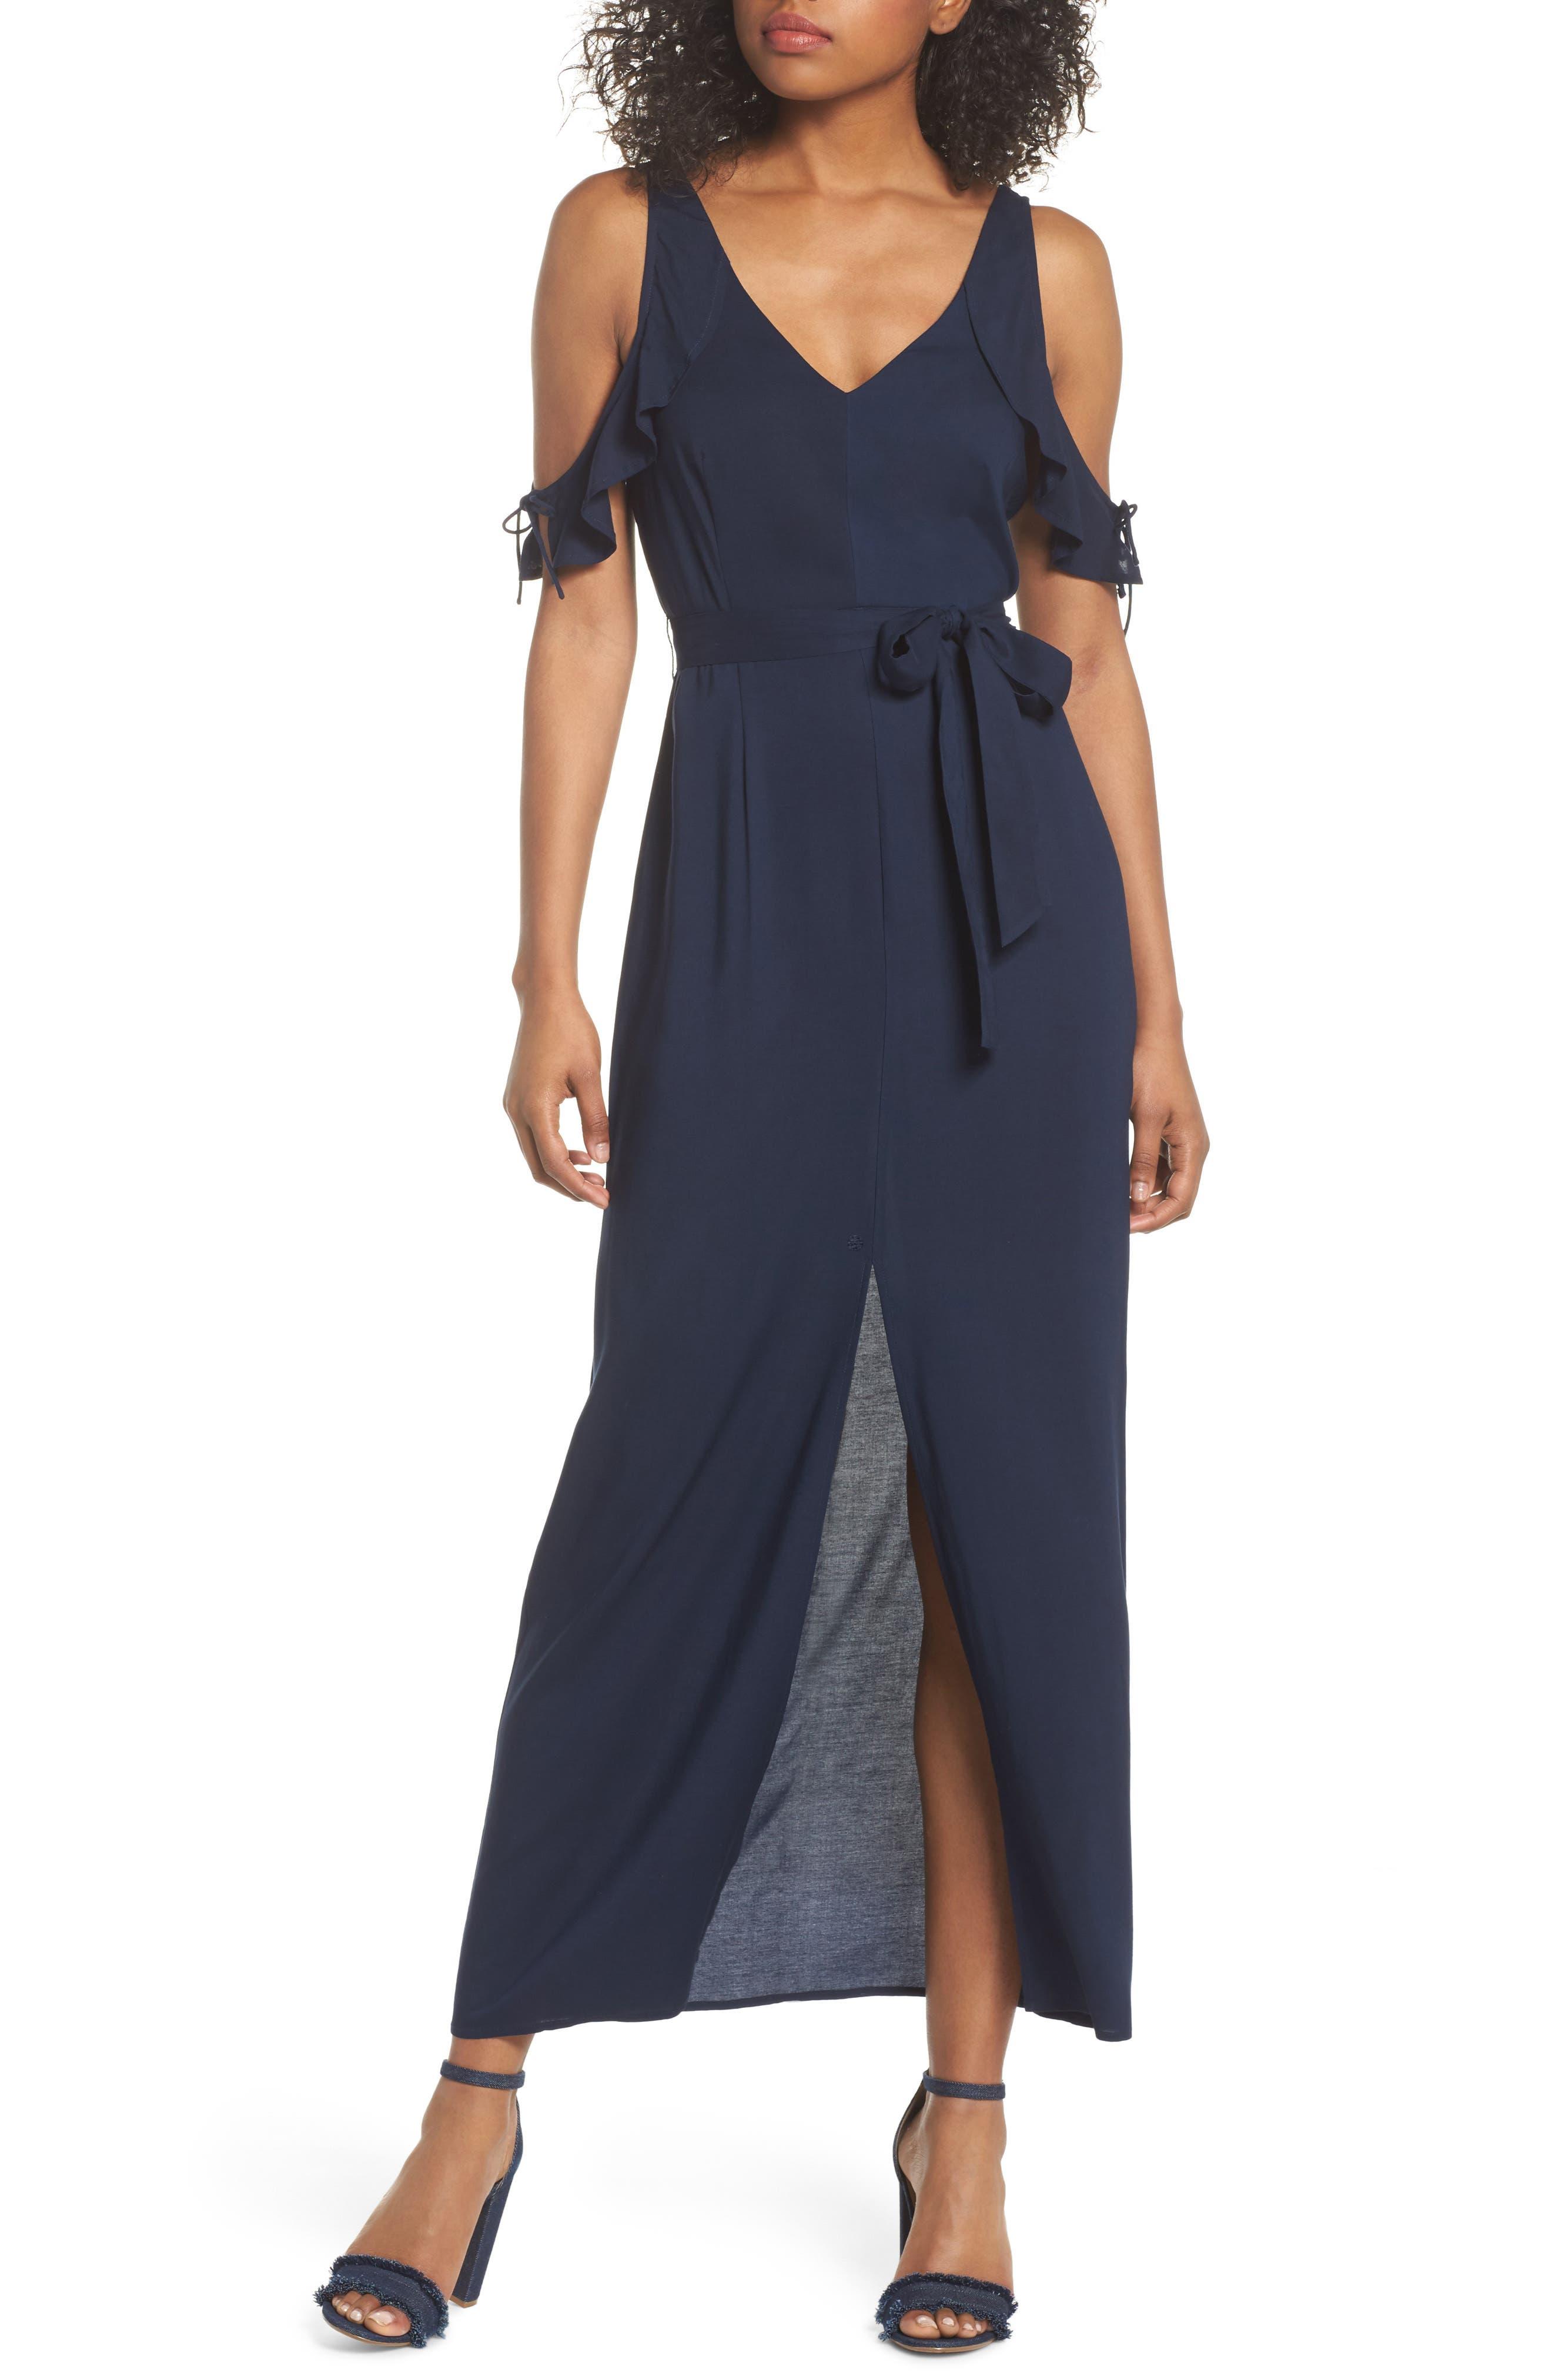 PAIGE Lystra Cold Shoulder Maxi Dress